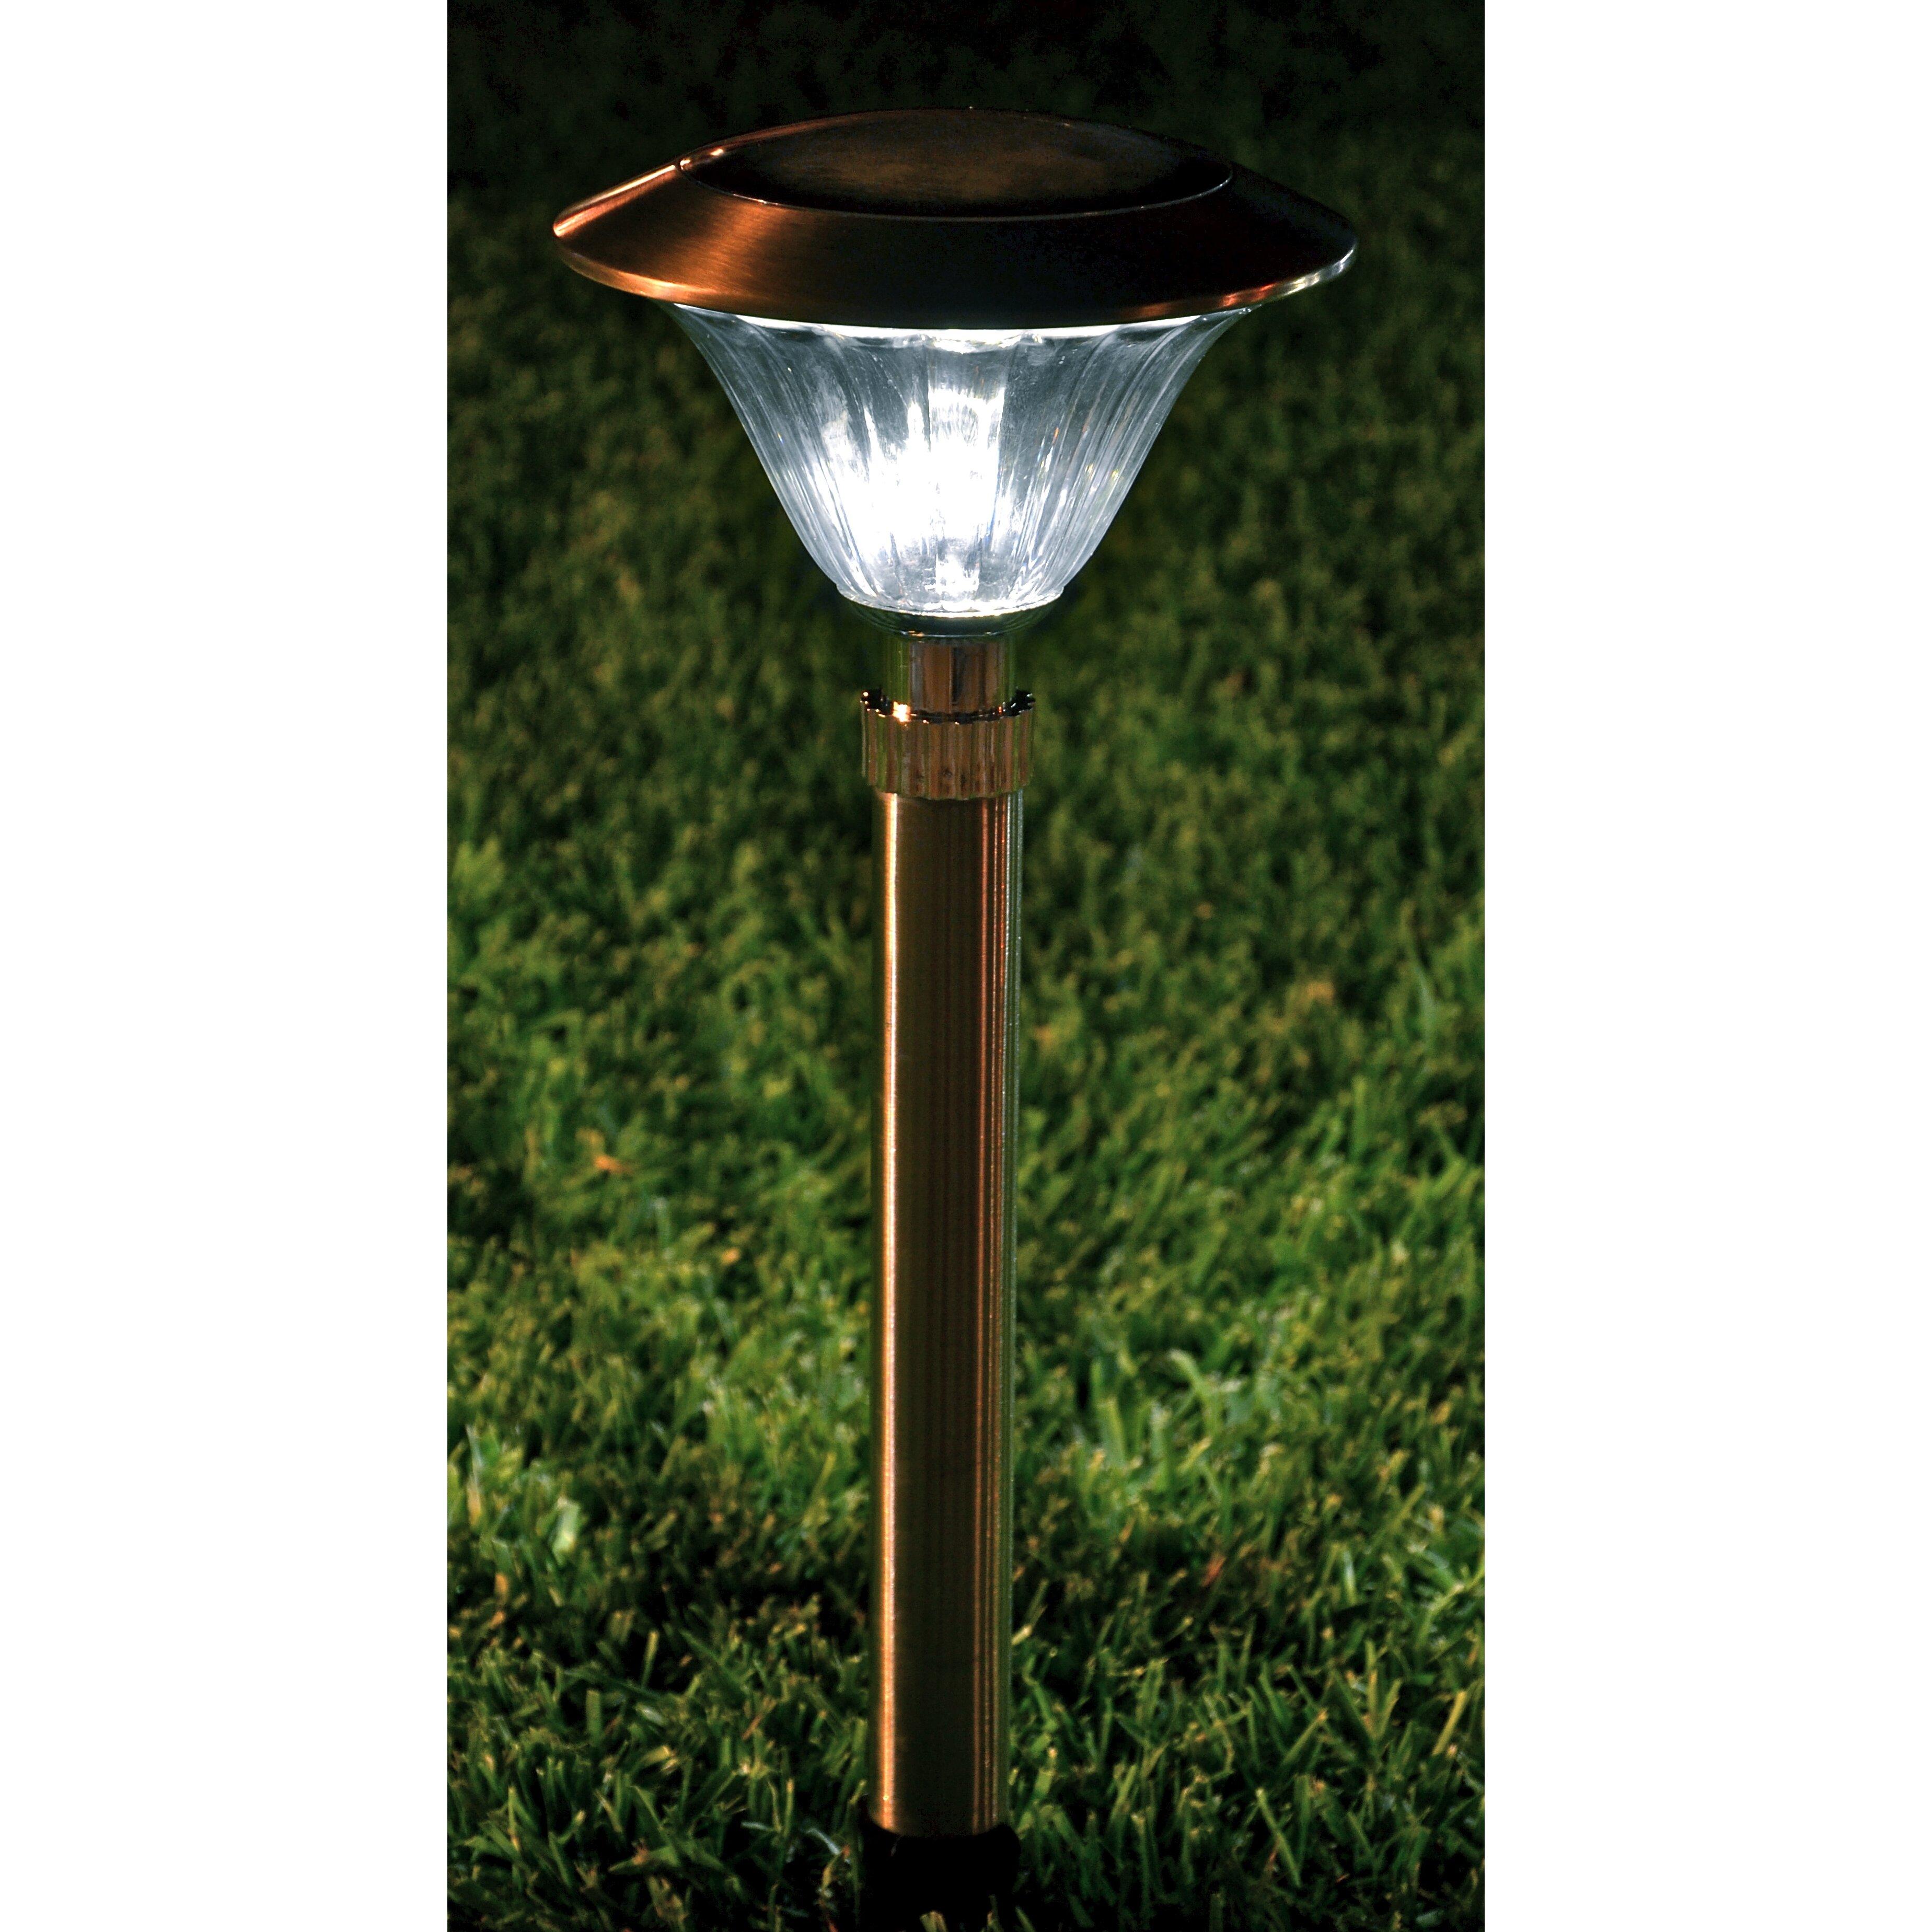 Solar power round recessed deck dock pathway garden led light ebay - Outdoor Led Light